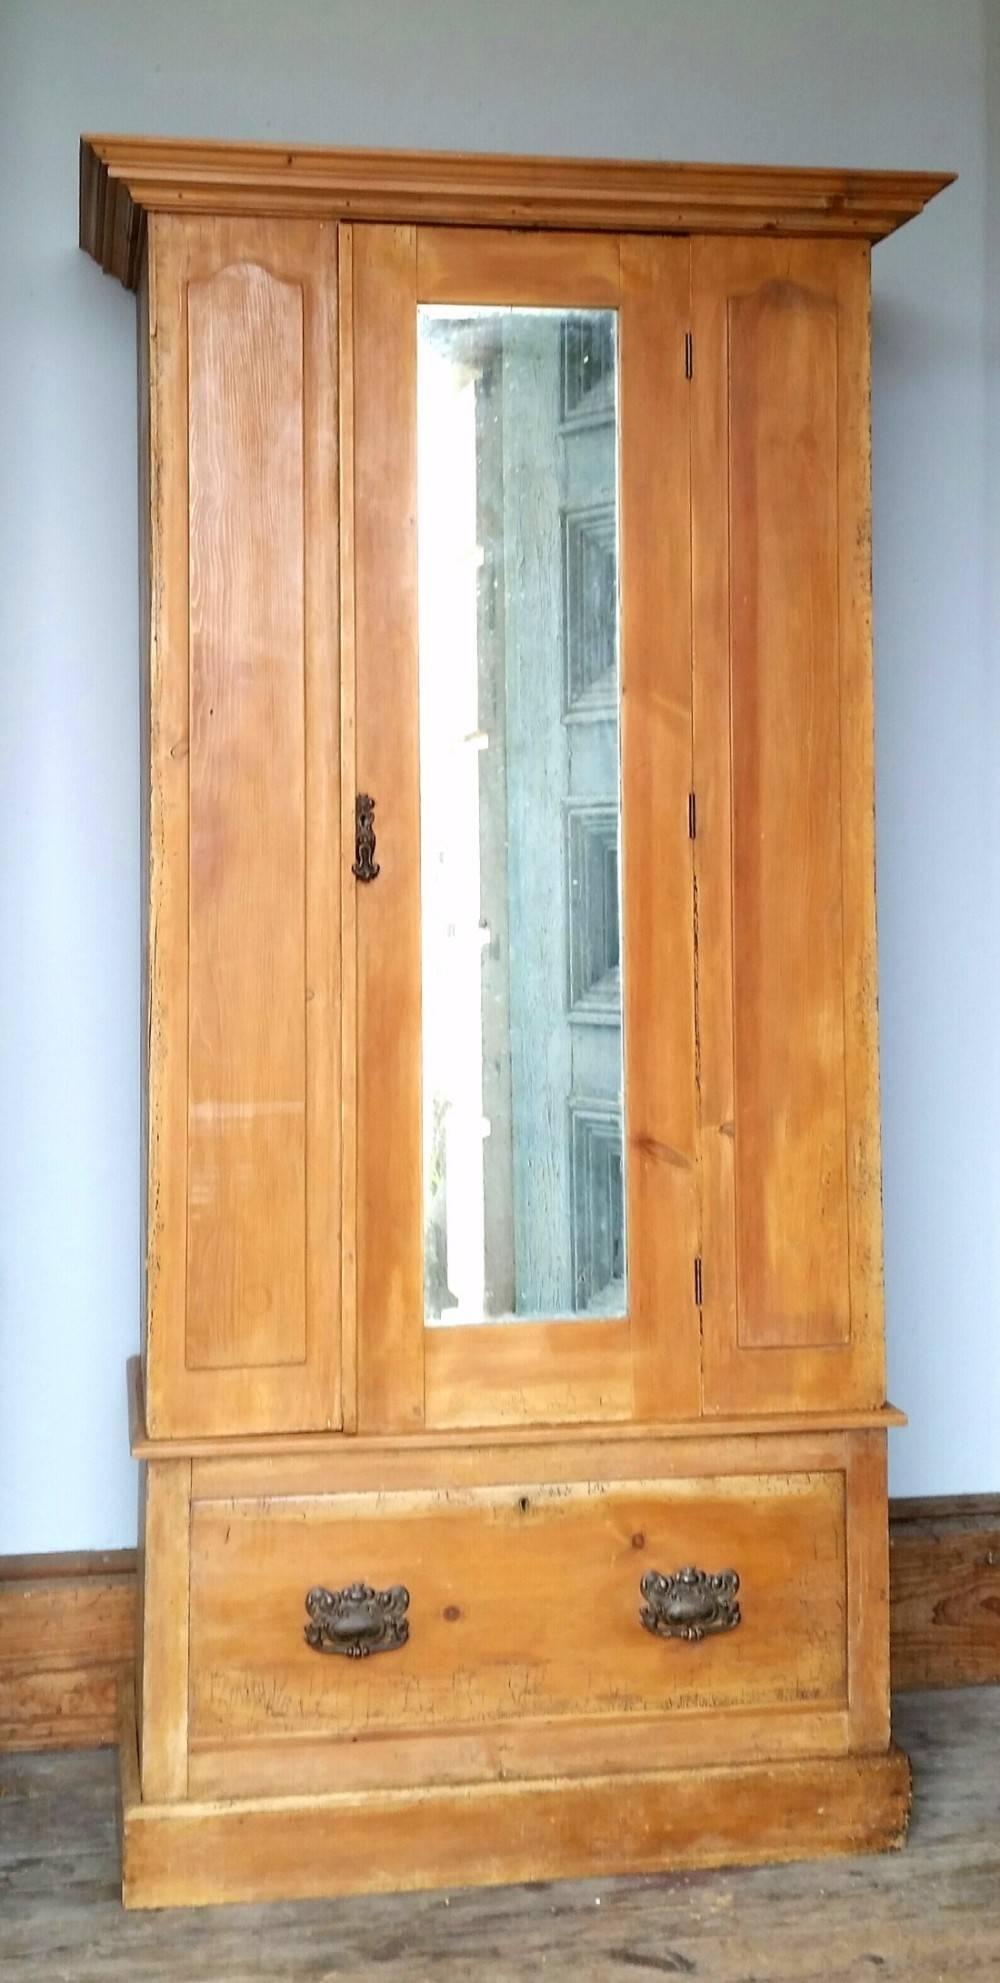 Victorian Pine Wardrobe | 432737 | Sellingantiques.co.uk pertaining to Victorian Pine Wardrobes (Image 14 of 15)